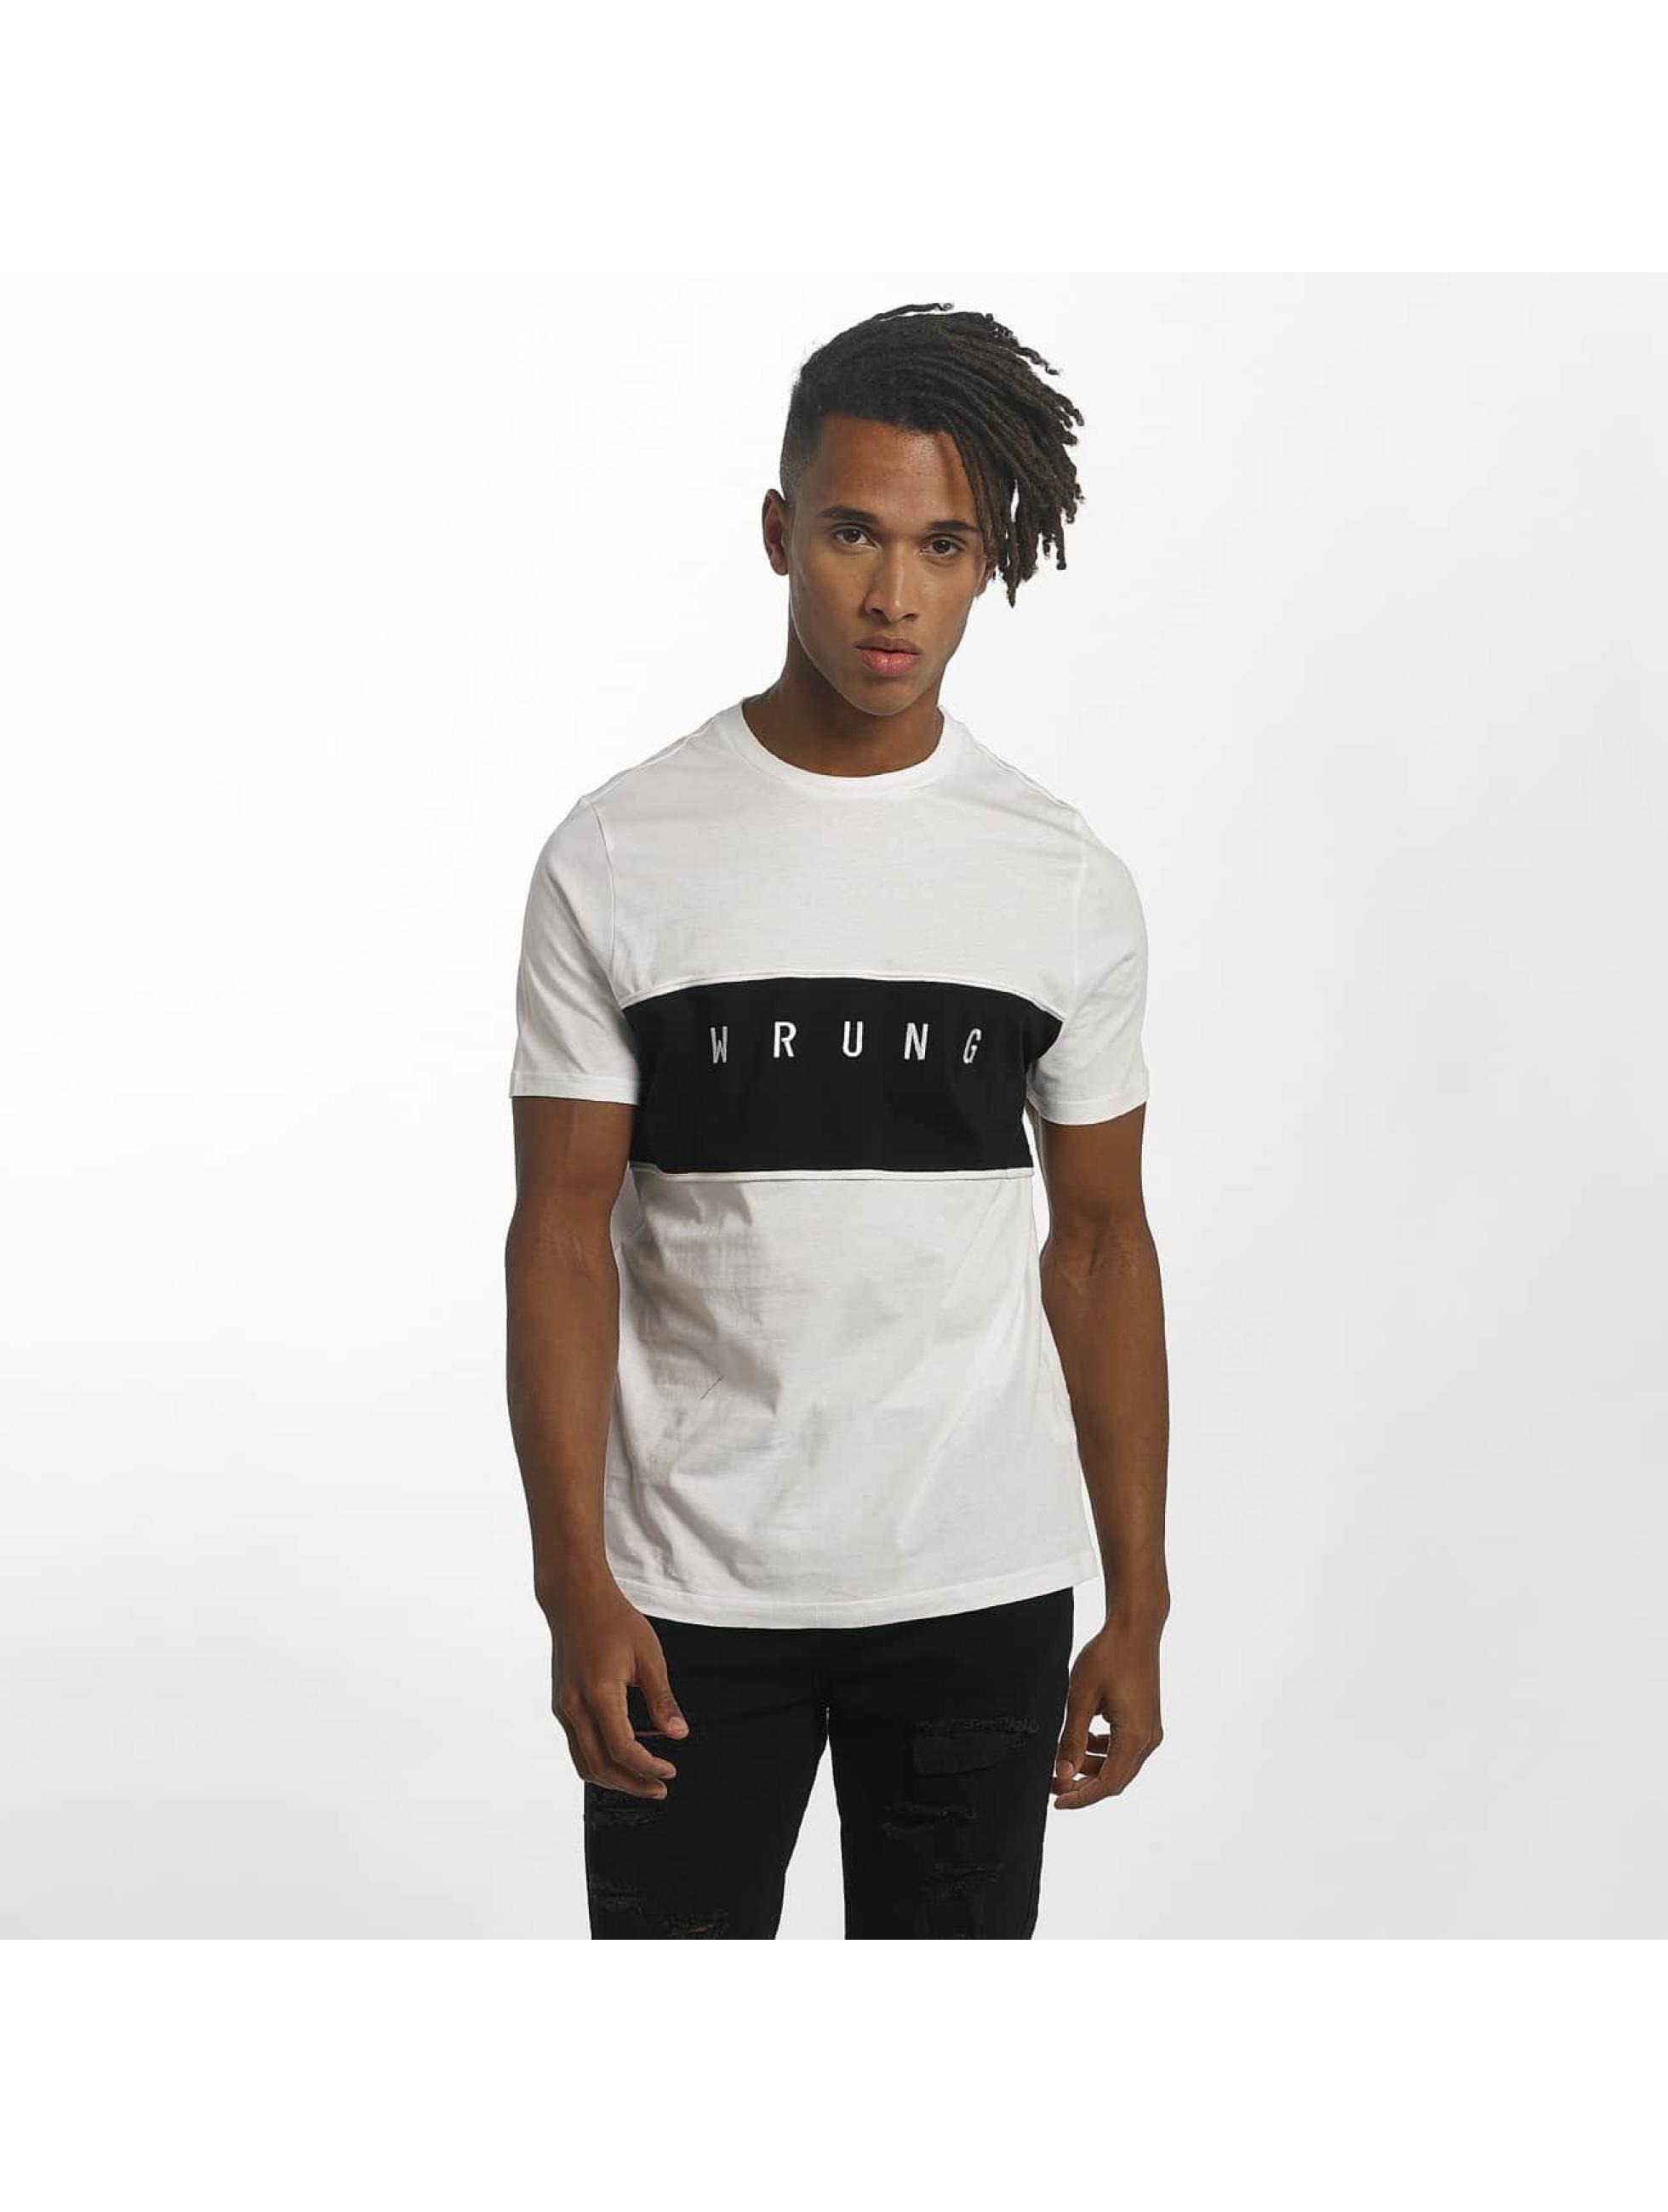 Wrung Division T-Shirt Dist weiß